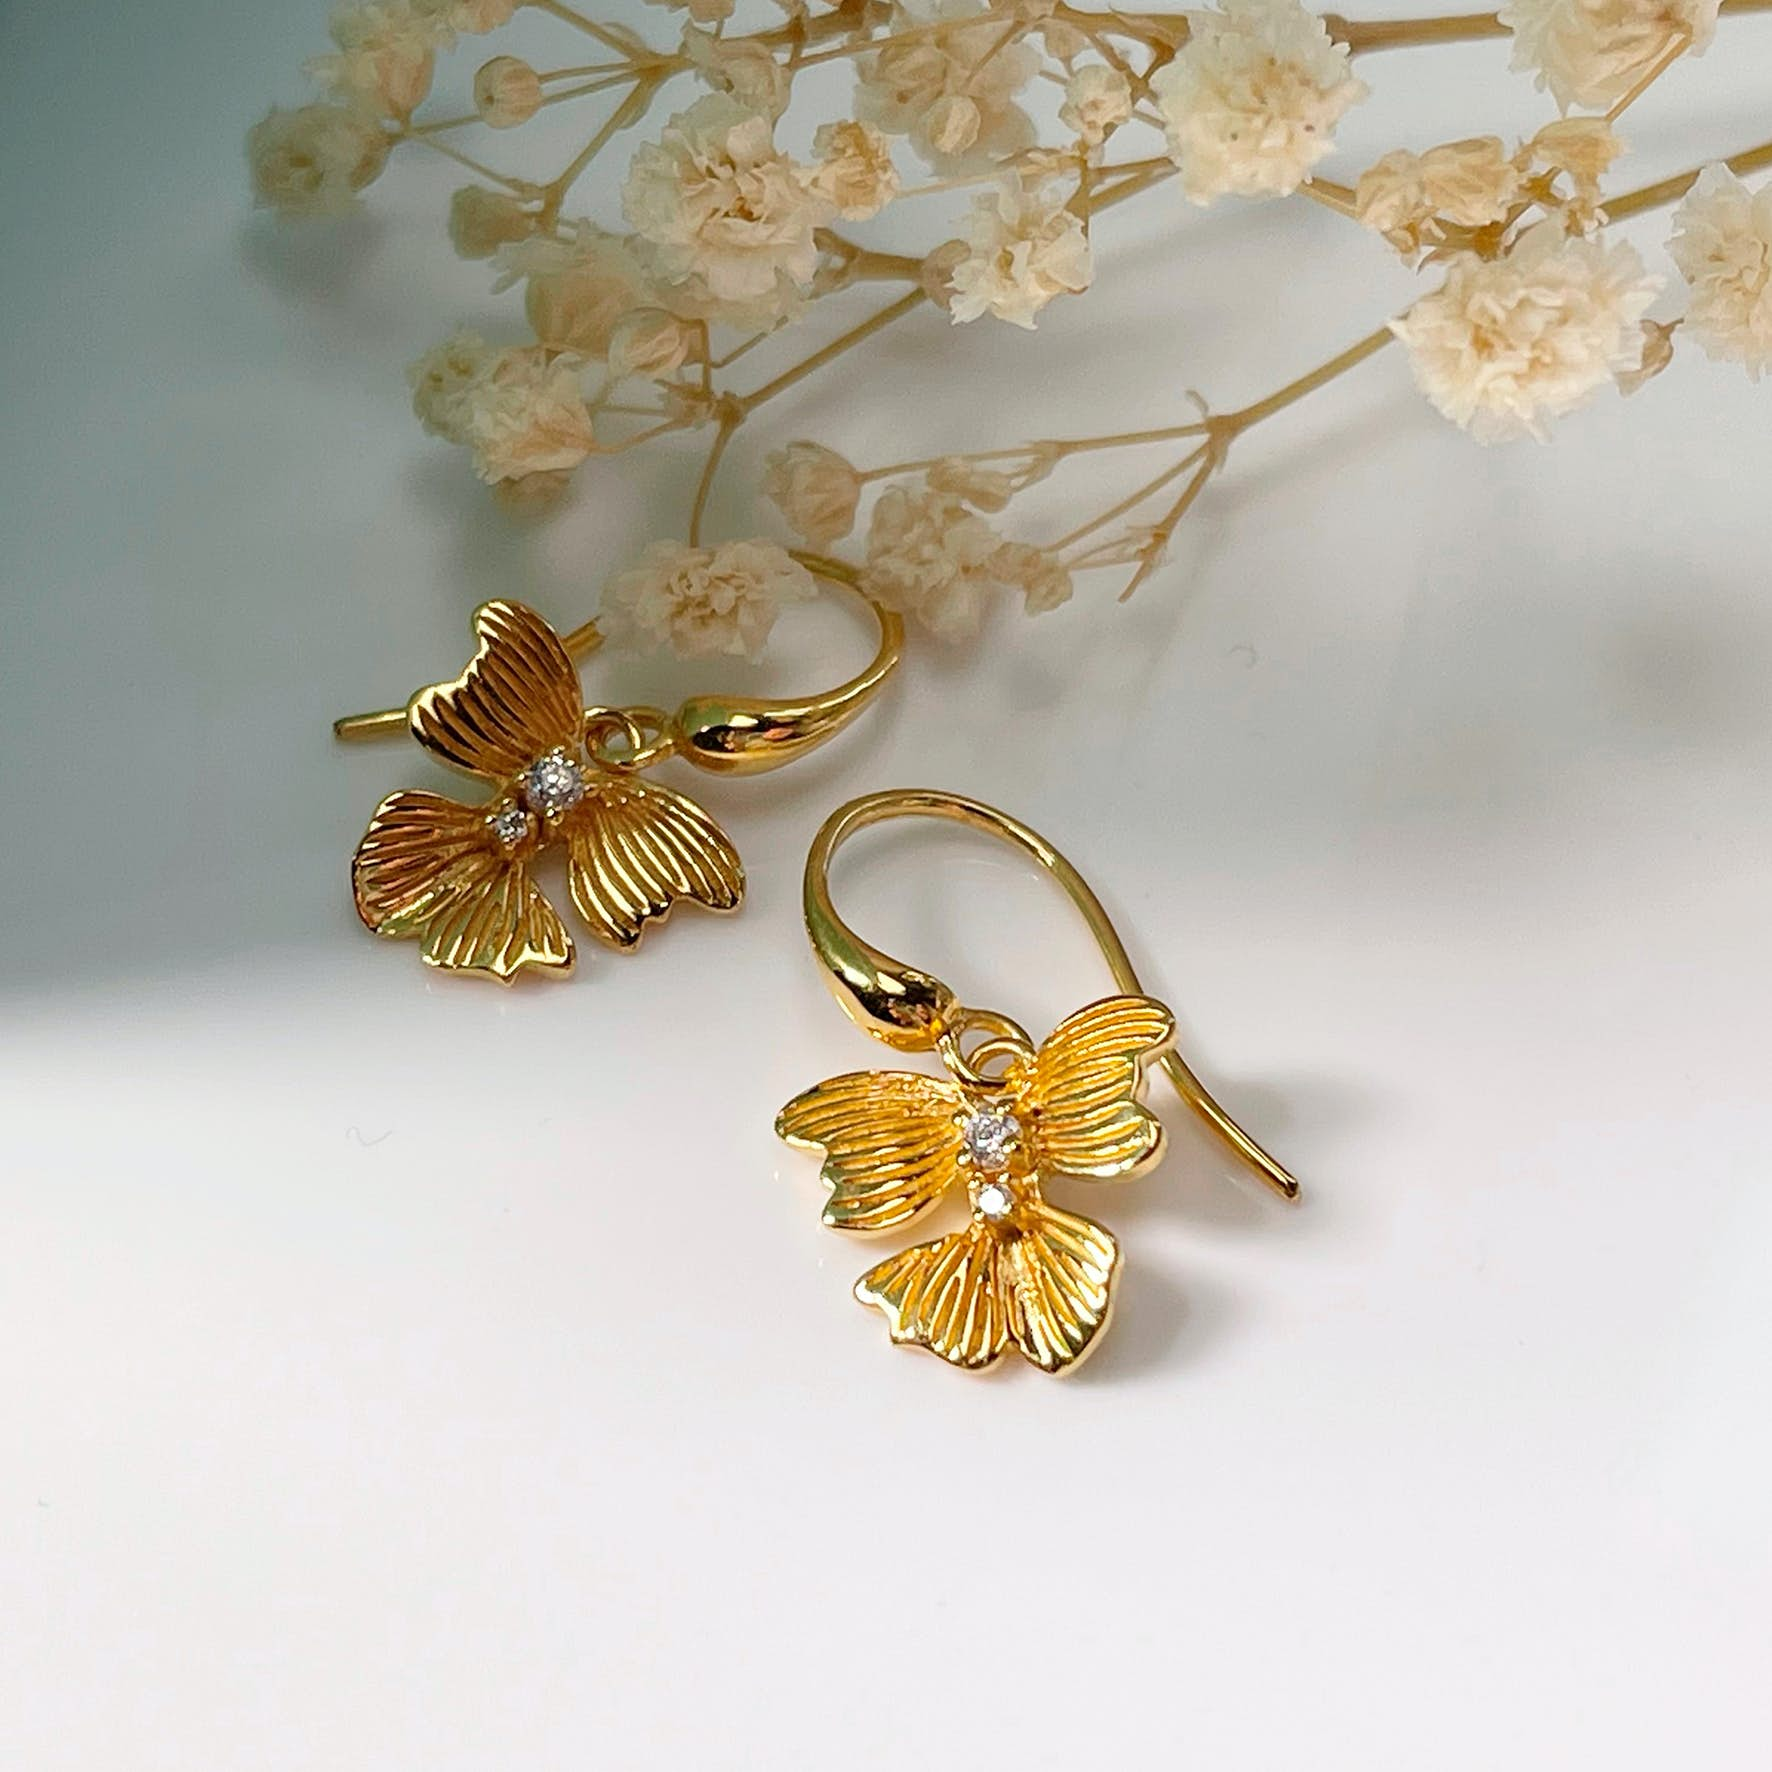 Violet Earrings von Izabel Camille in Vergoldet-Silber Sterling 925